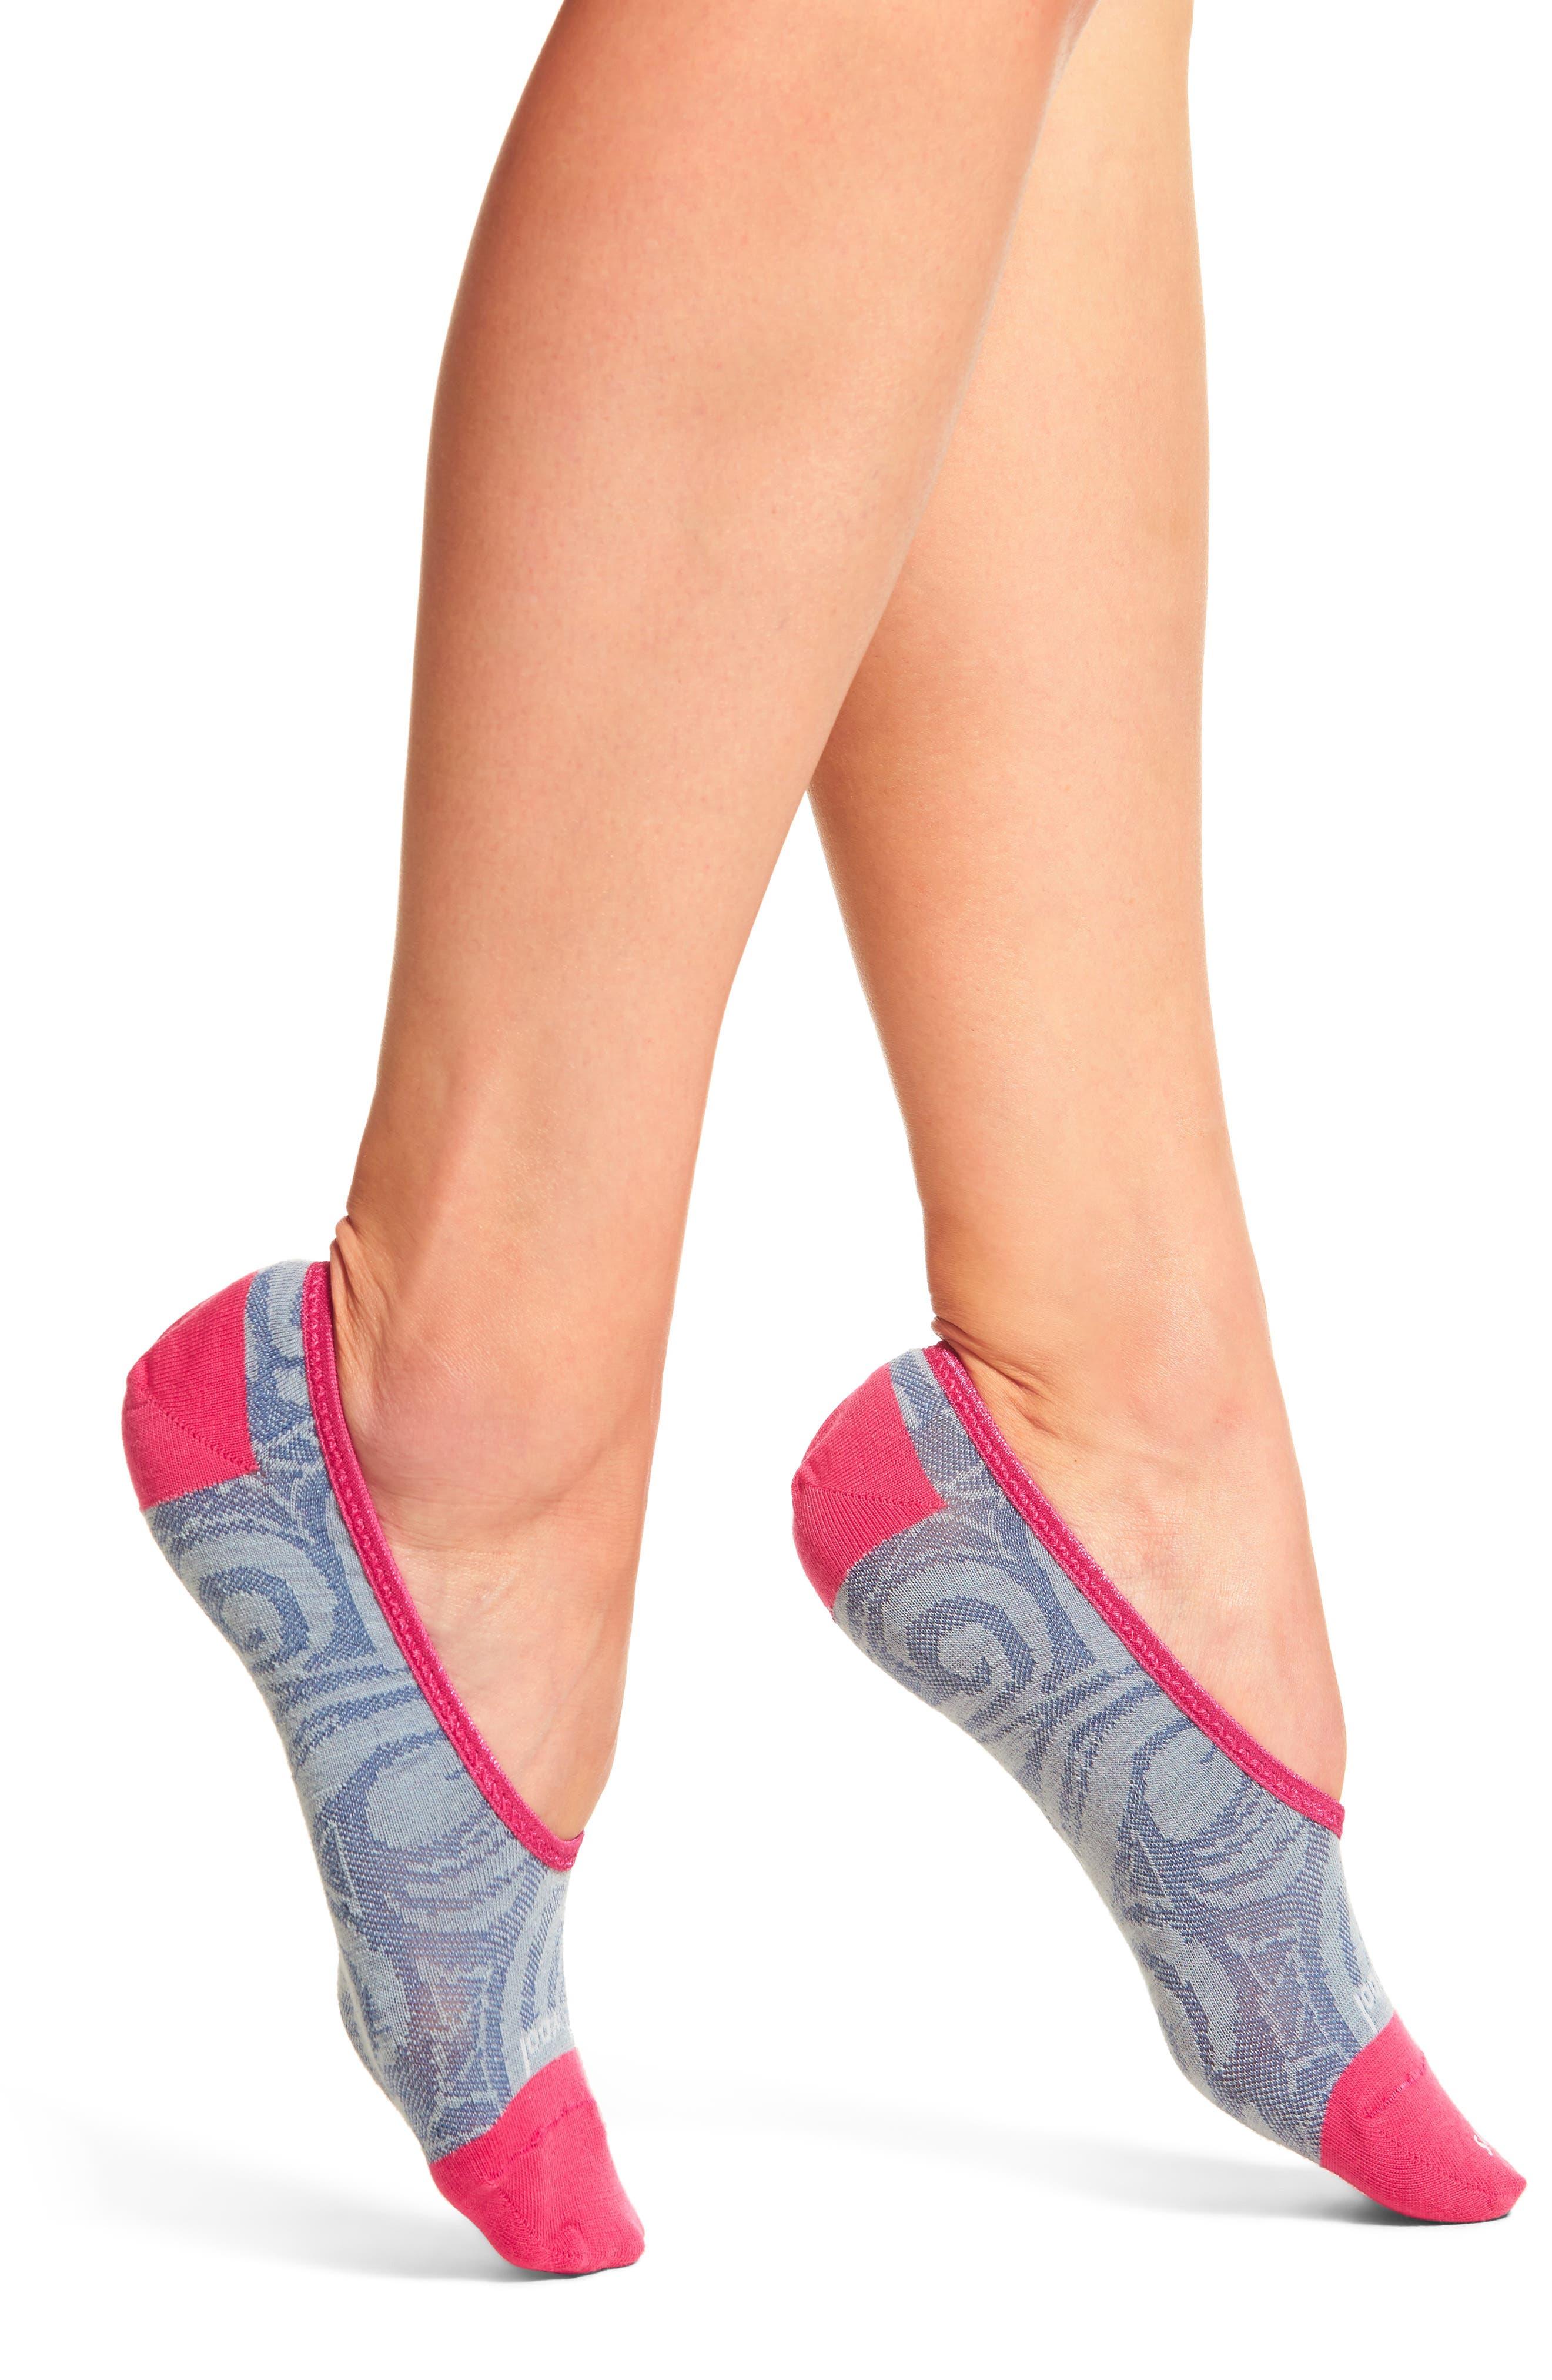 Sadie Swirl Hide & Seek No-Show Socks,                             Main thumbnail 1, color,                             Blue Ice Heather